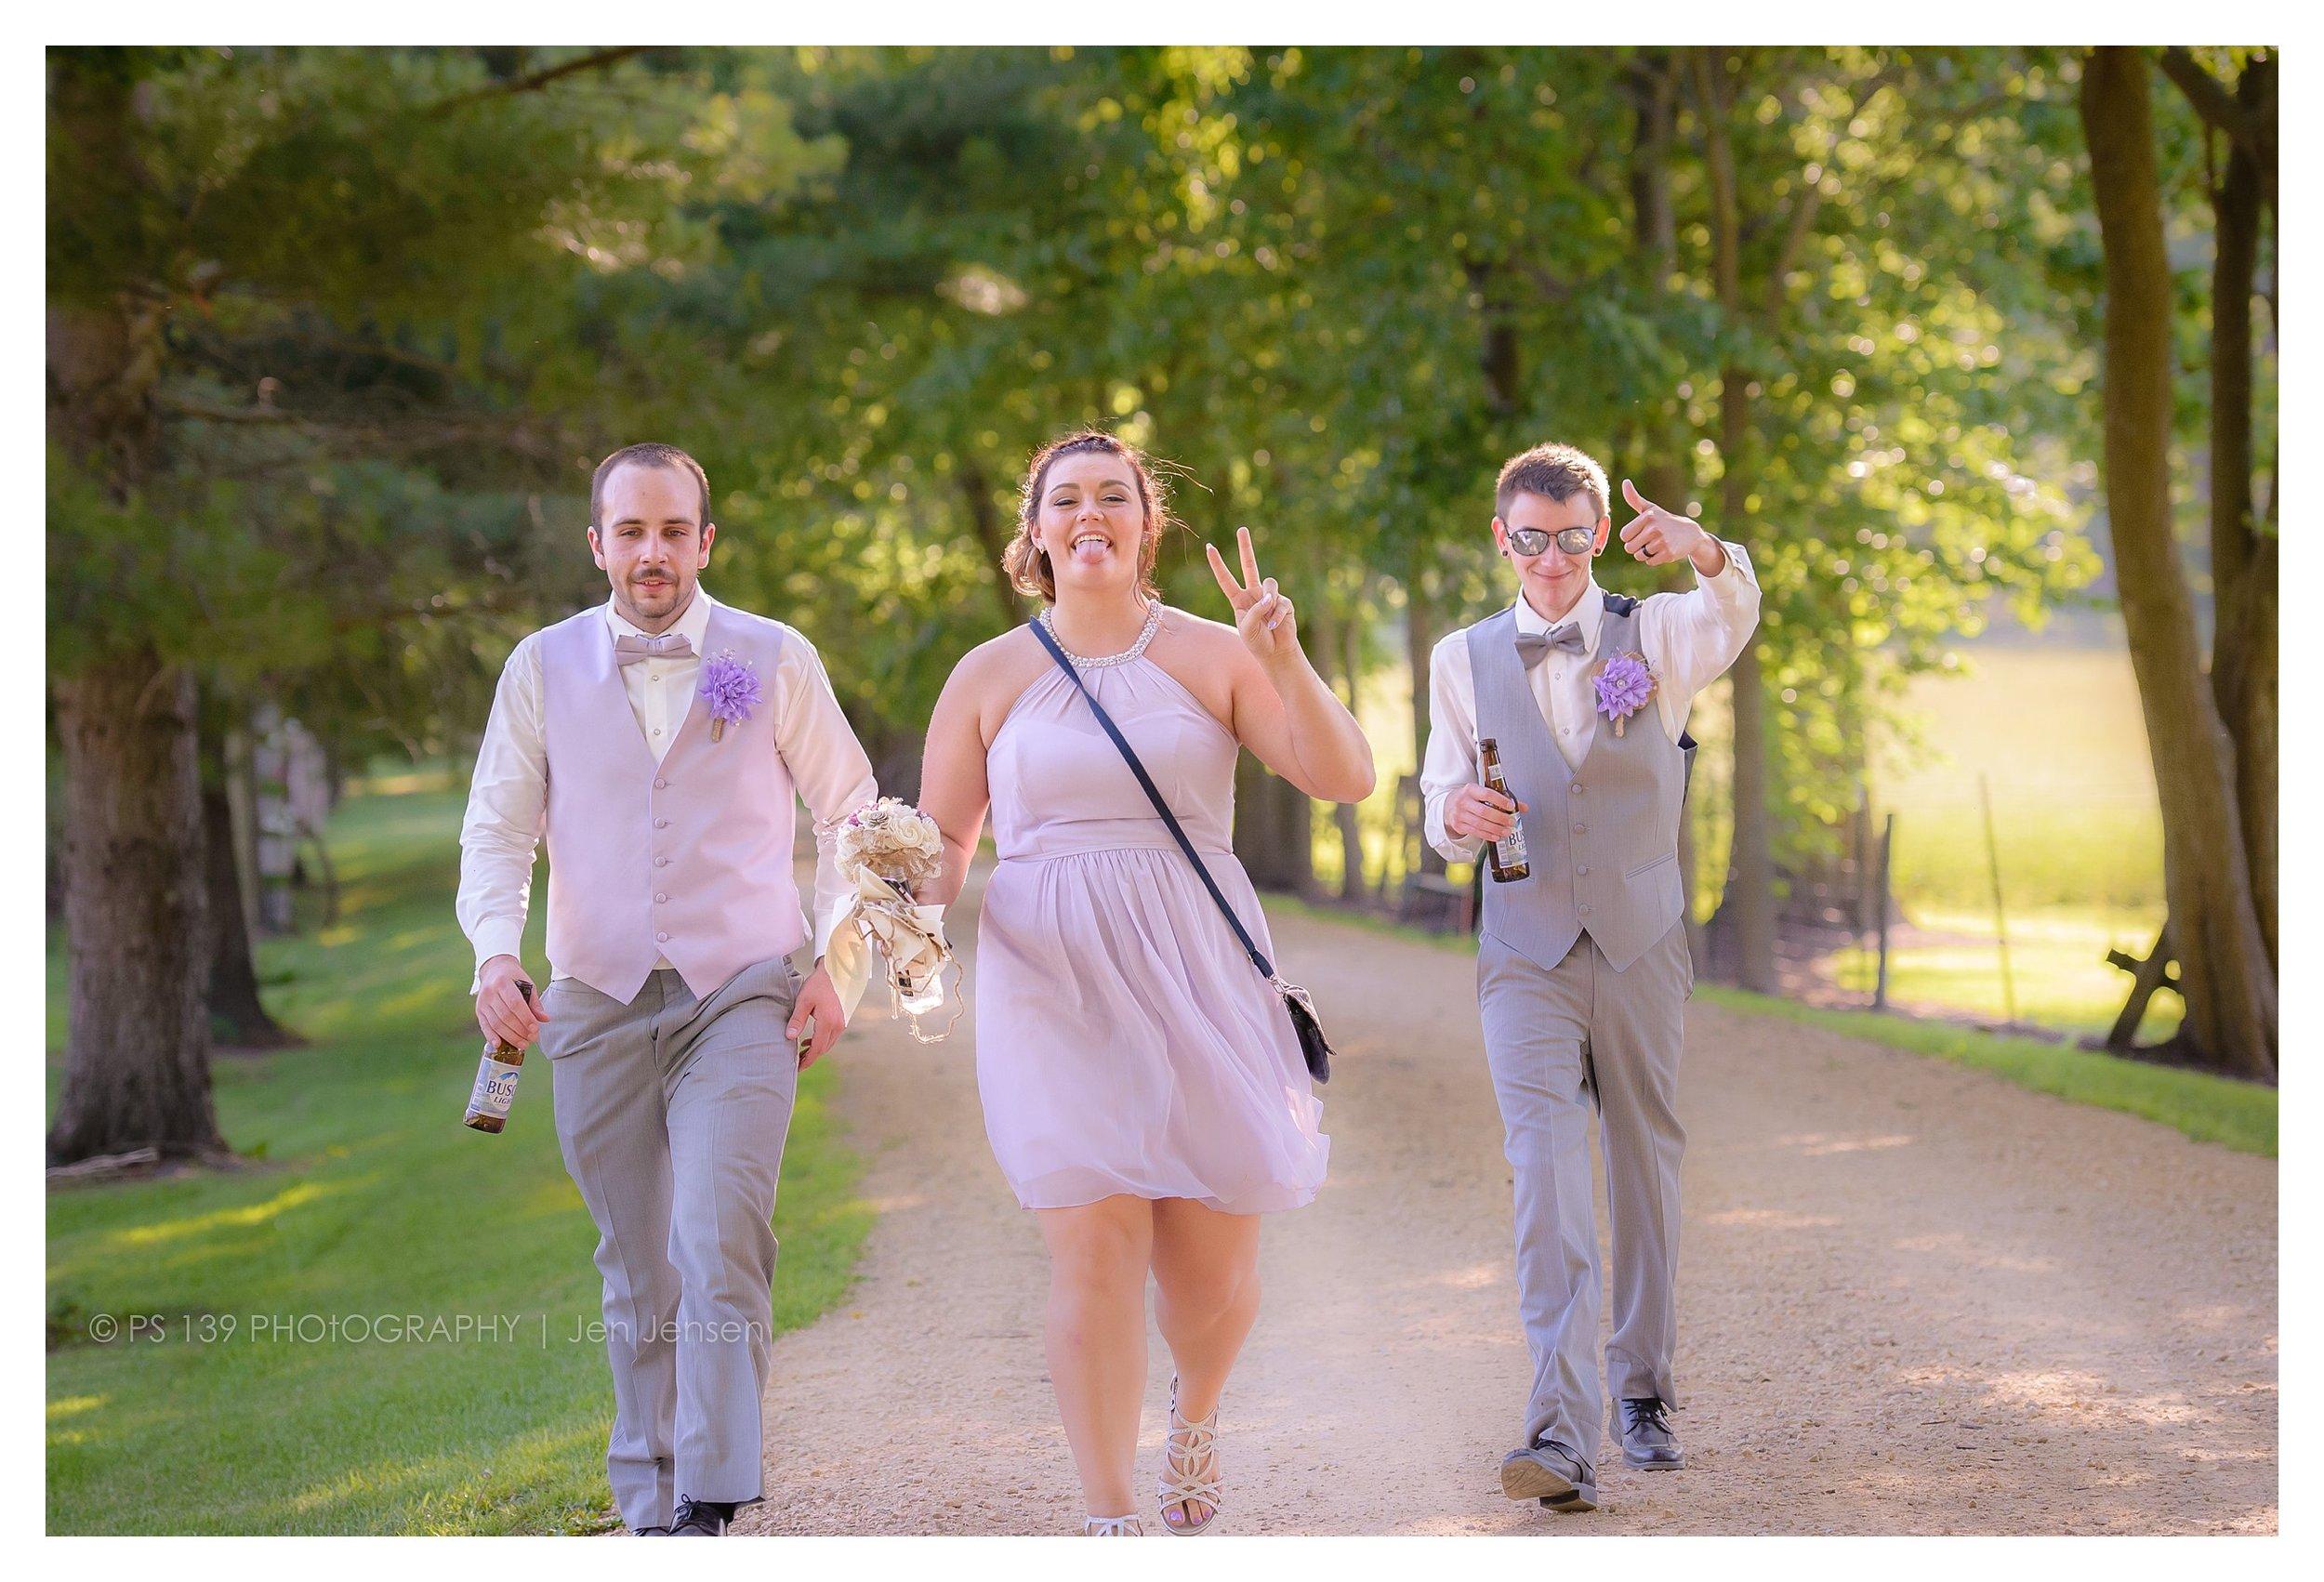 oregon Illinois oak lane farm wisconsin wedding photographer bayfield wi ps 139 photography jen jensen_0234.jpg